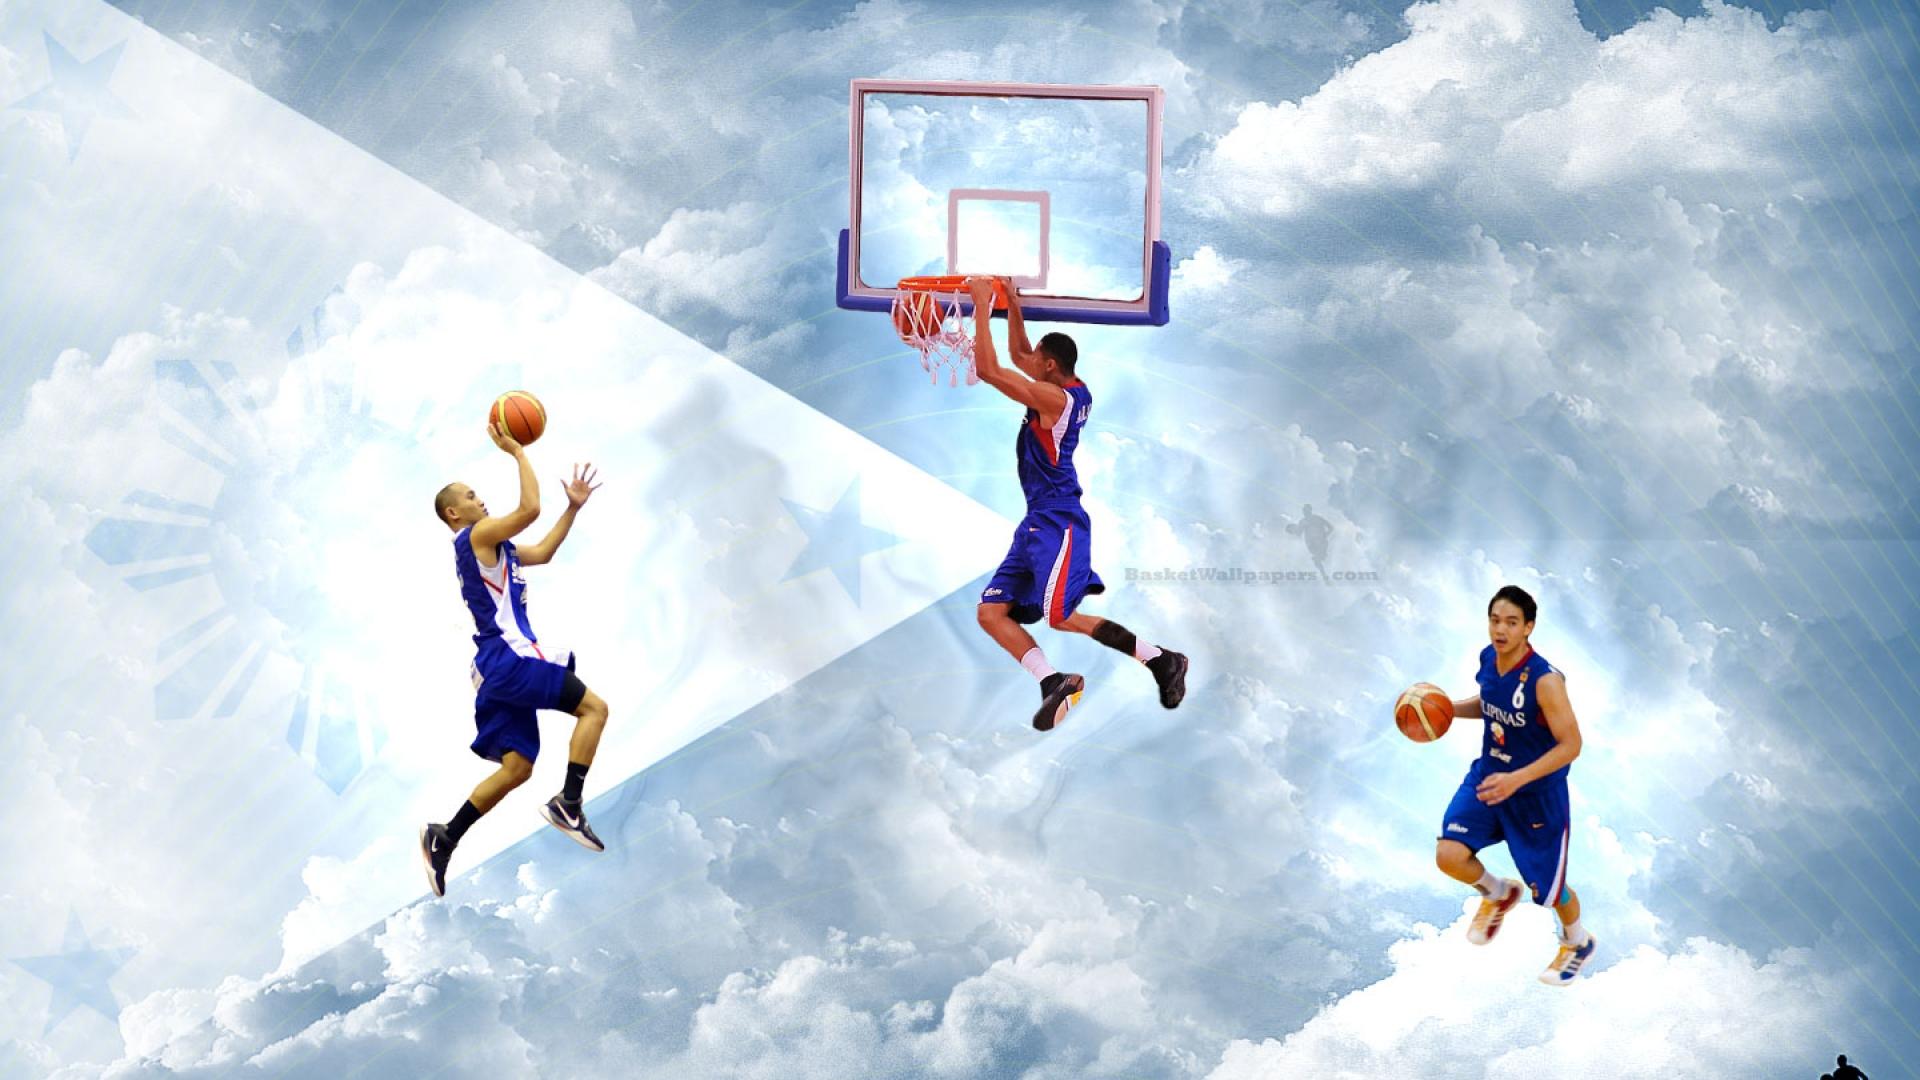 Casio-Aguilar-NBA-Wallpaper_0